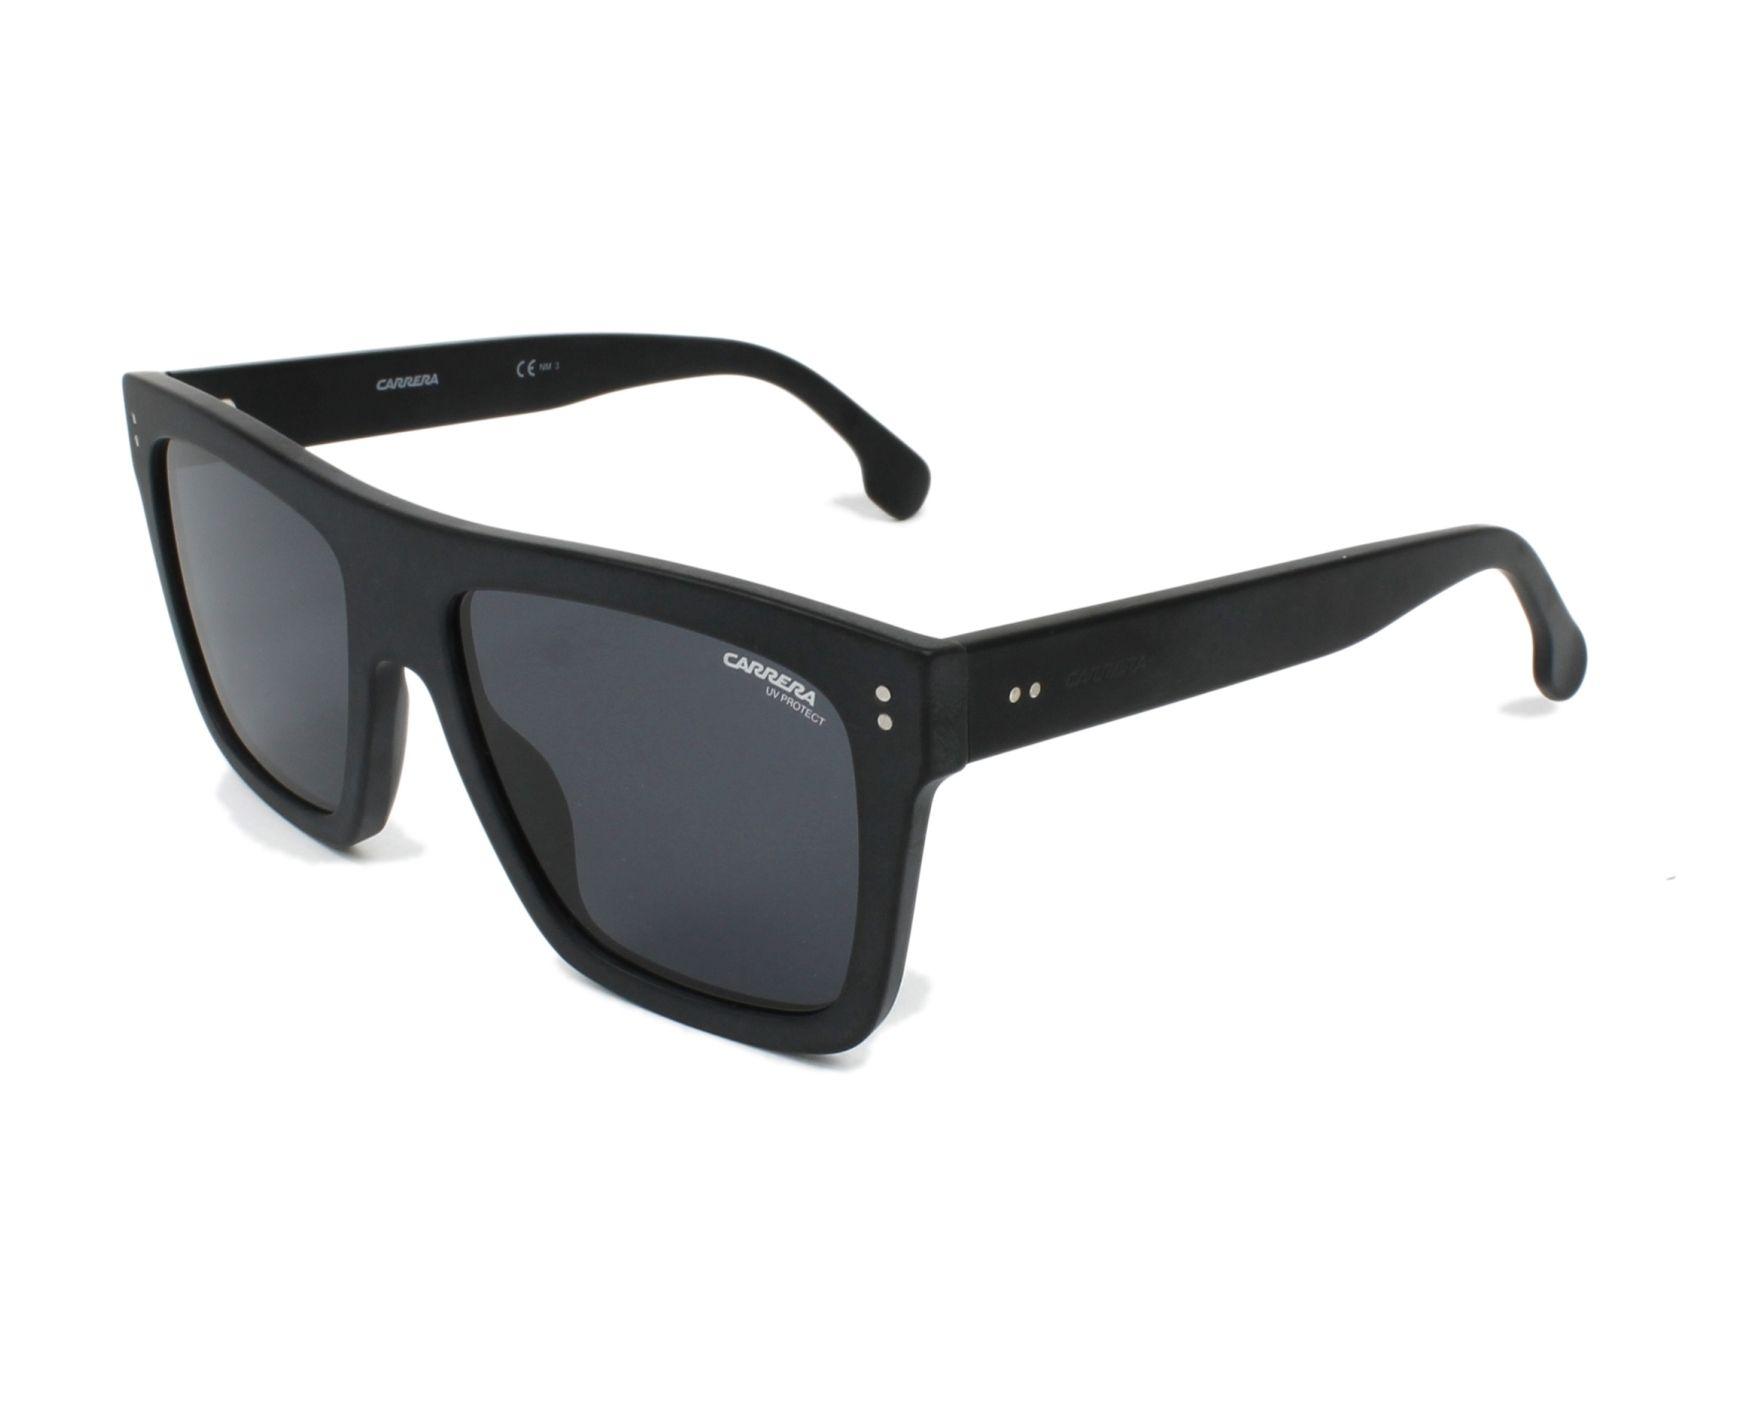 f47c867732c Sunglasses Carrera 1010-S 003 IR 55-18 Black profile view